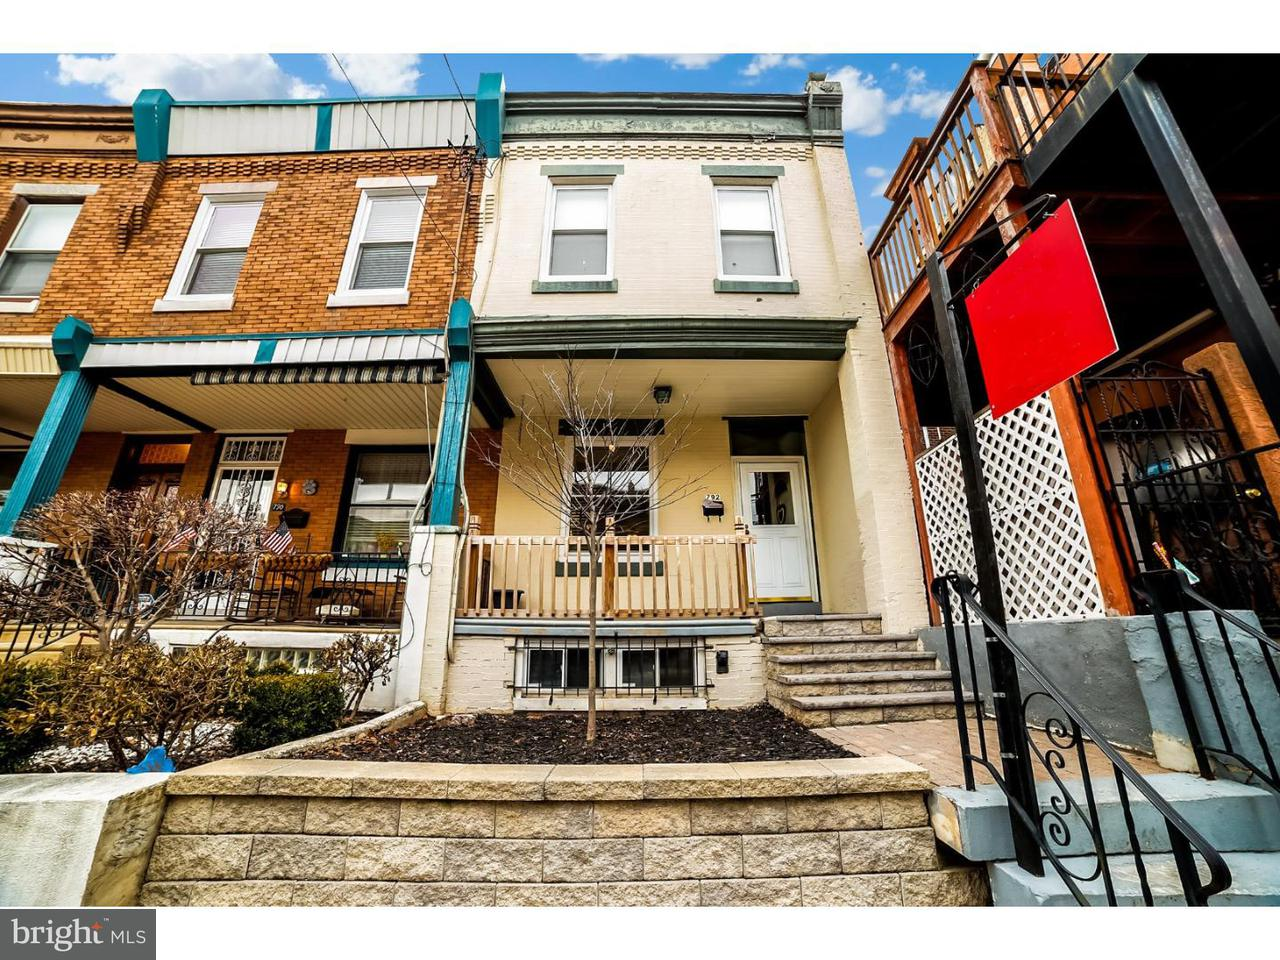 792 N Taney Philadelphia, PA 19130